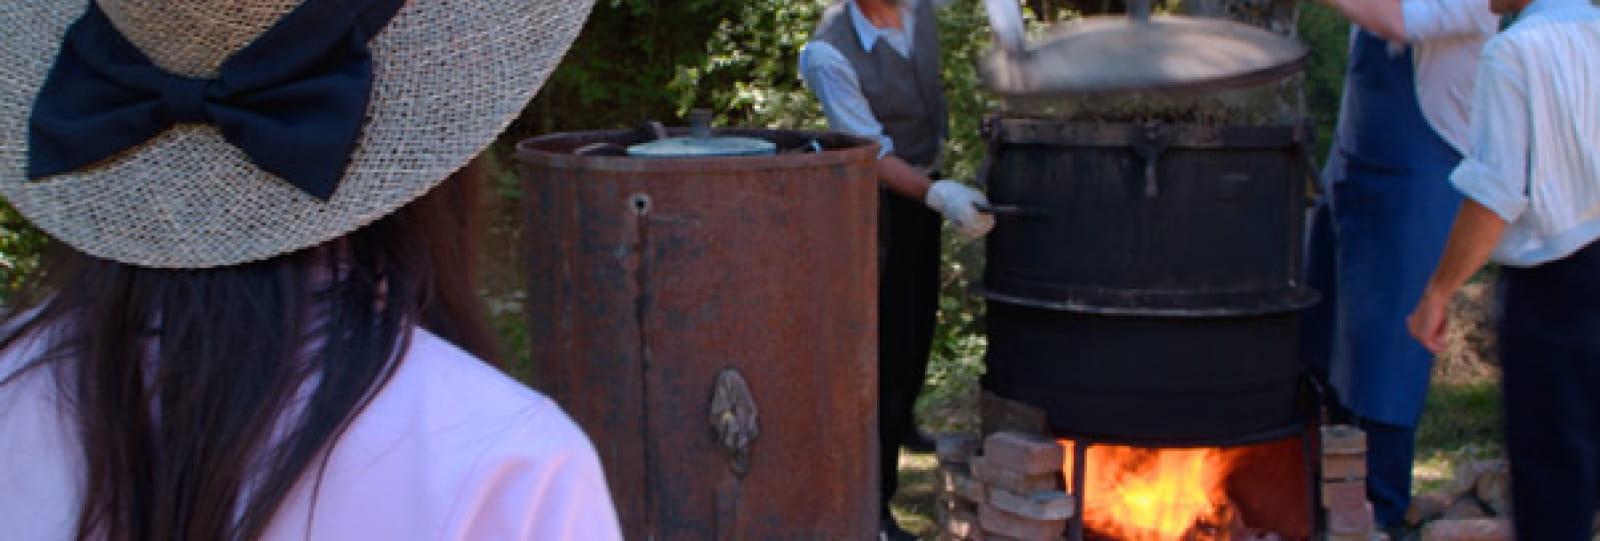 Distillation traditionnelle de lavande